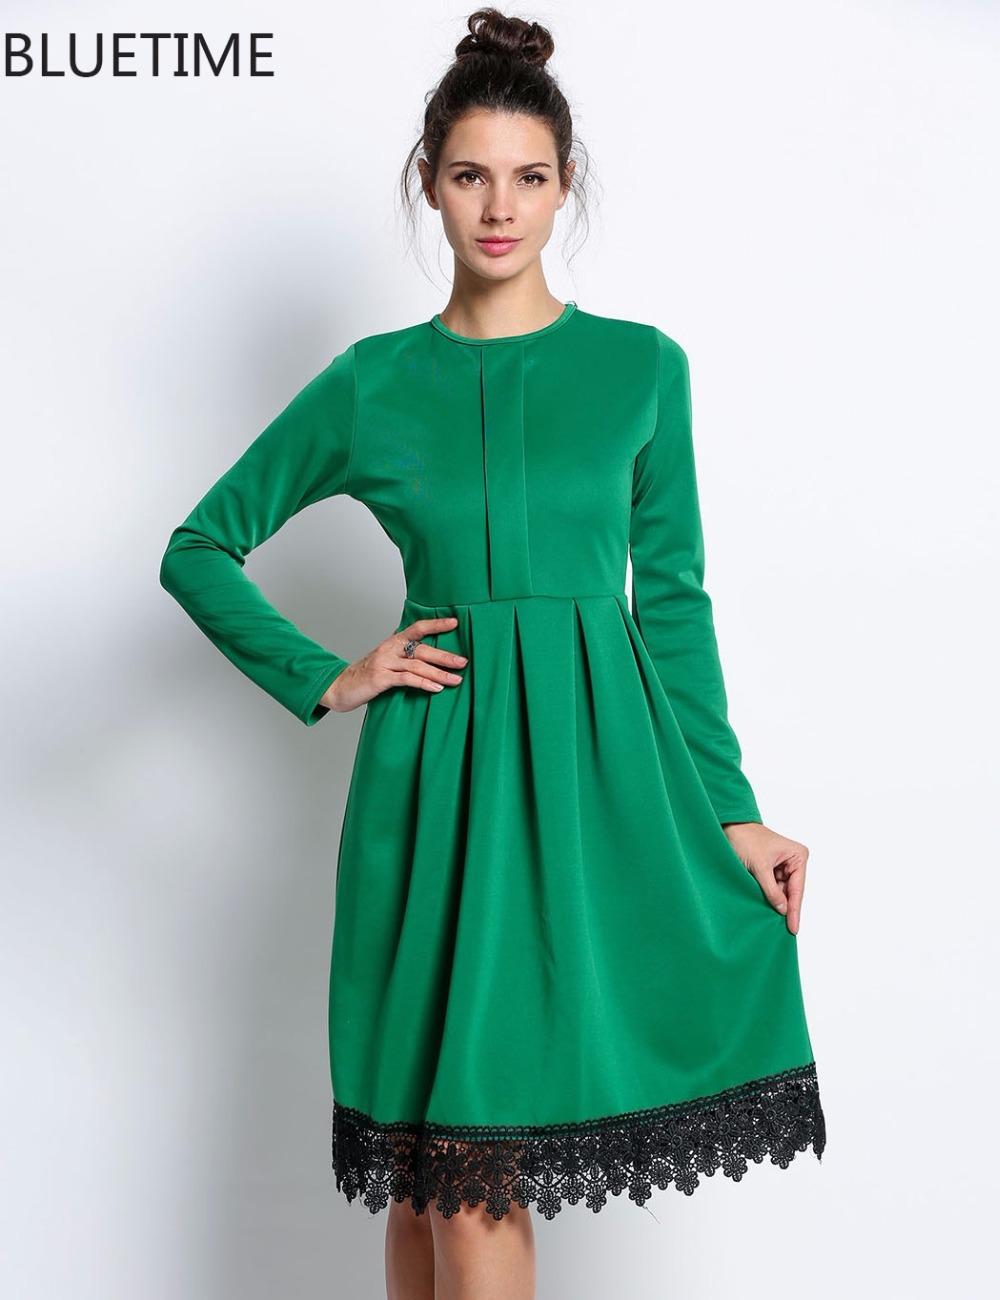 77bdd49fd13 Long Sleeve Club Dress - RoseGal.com